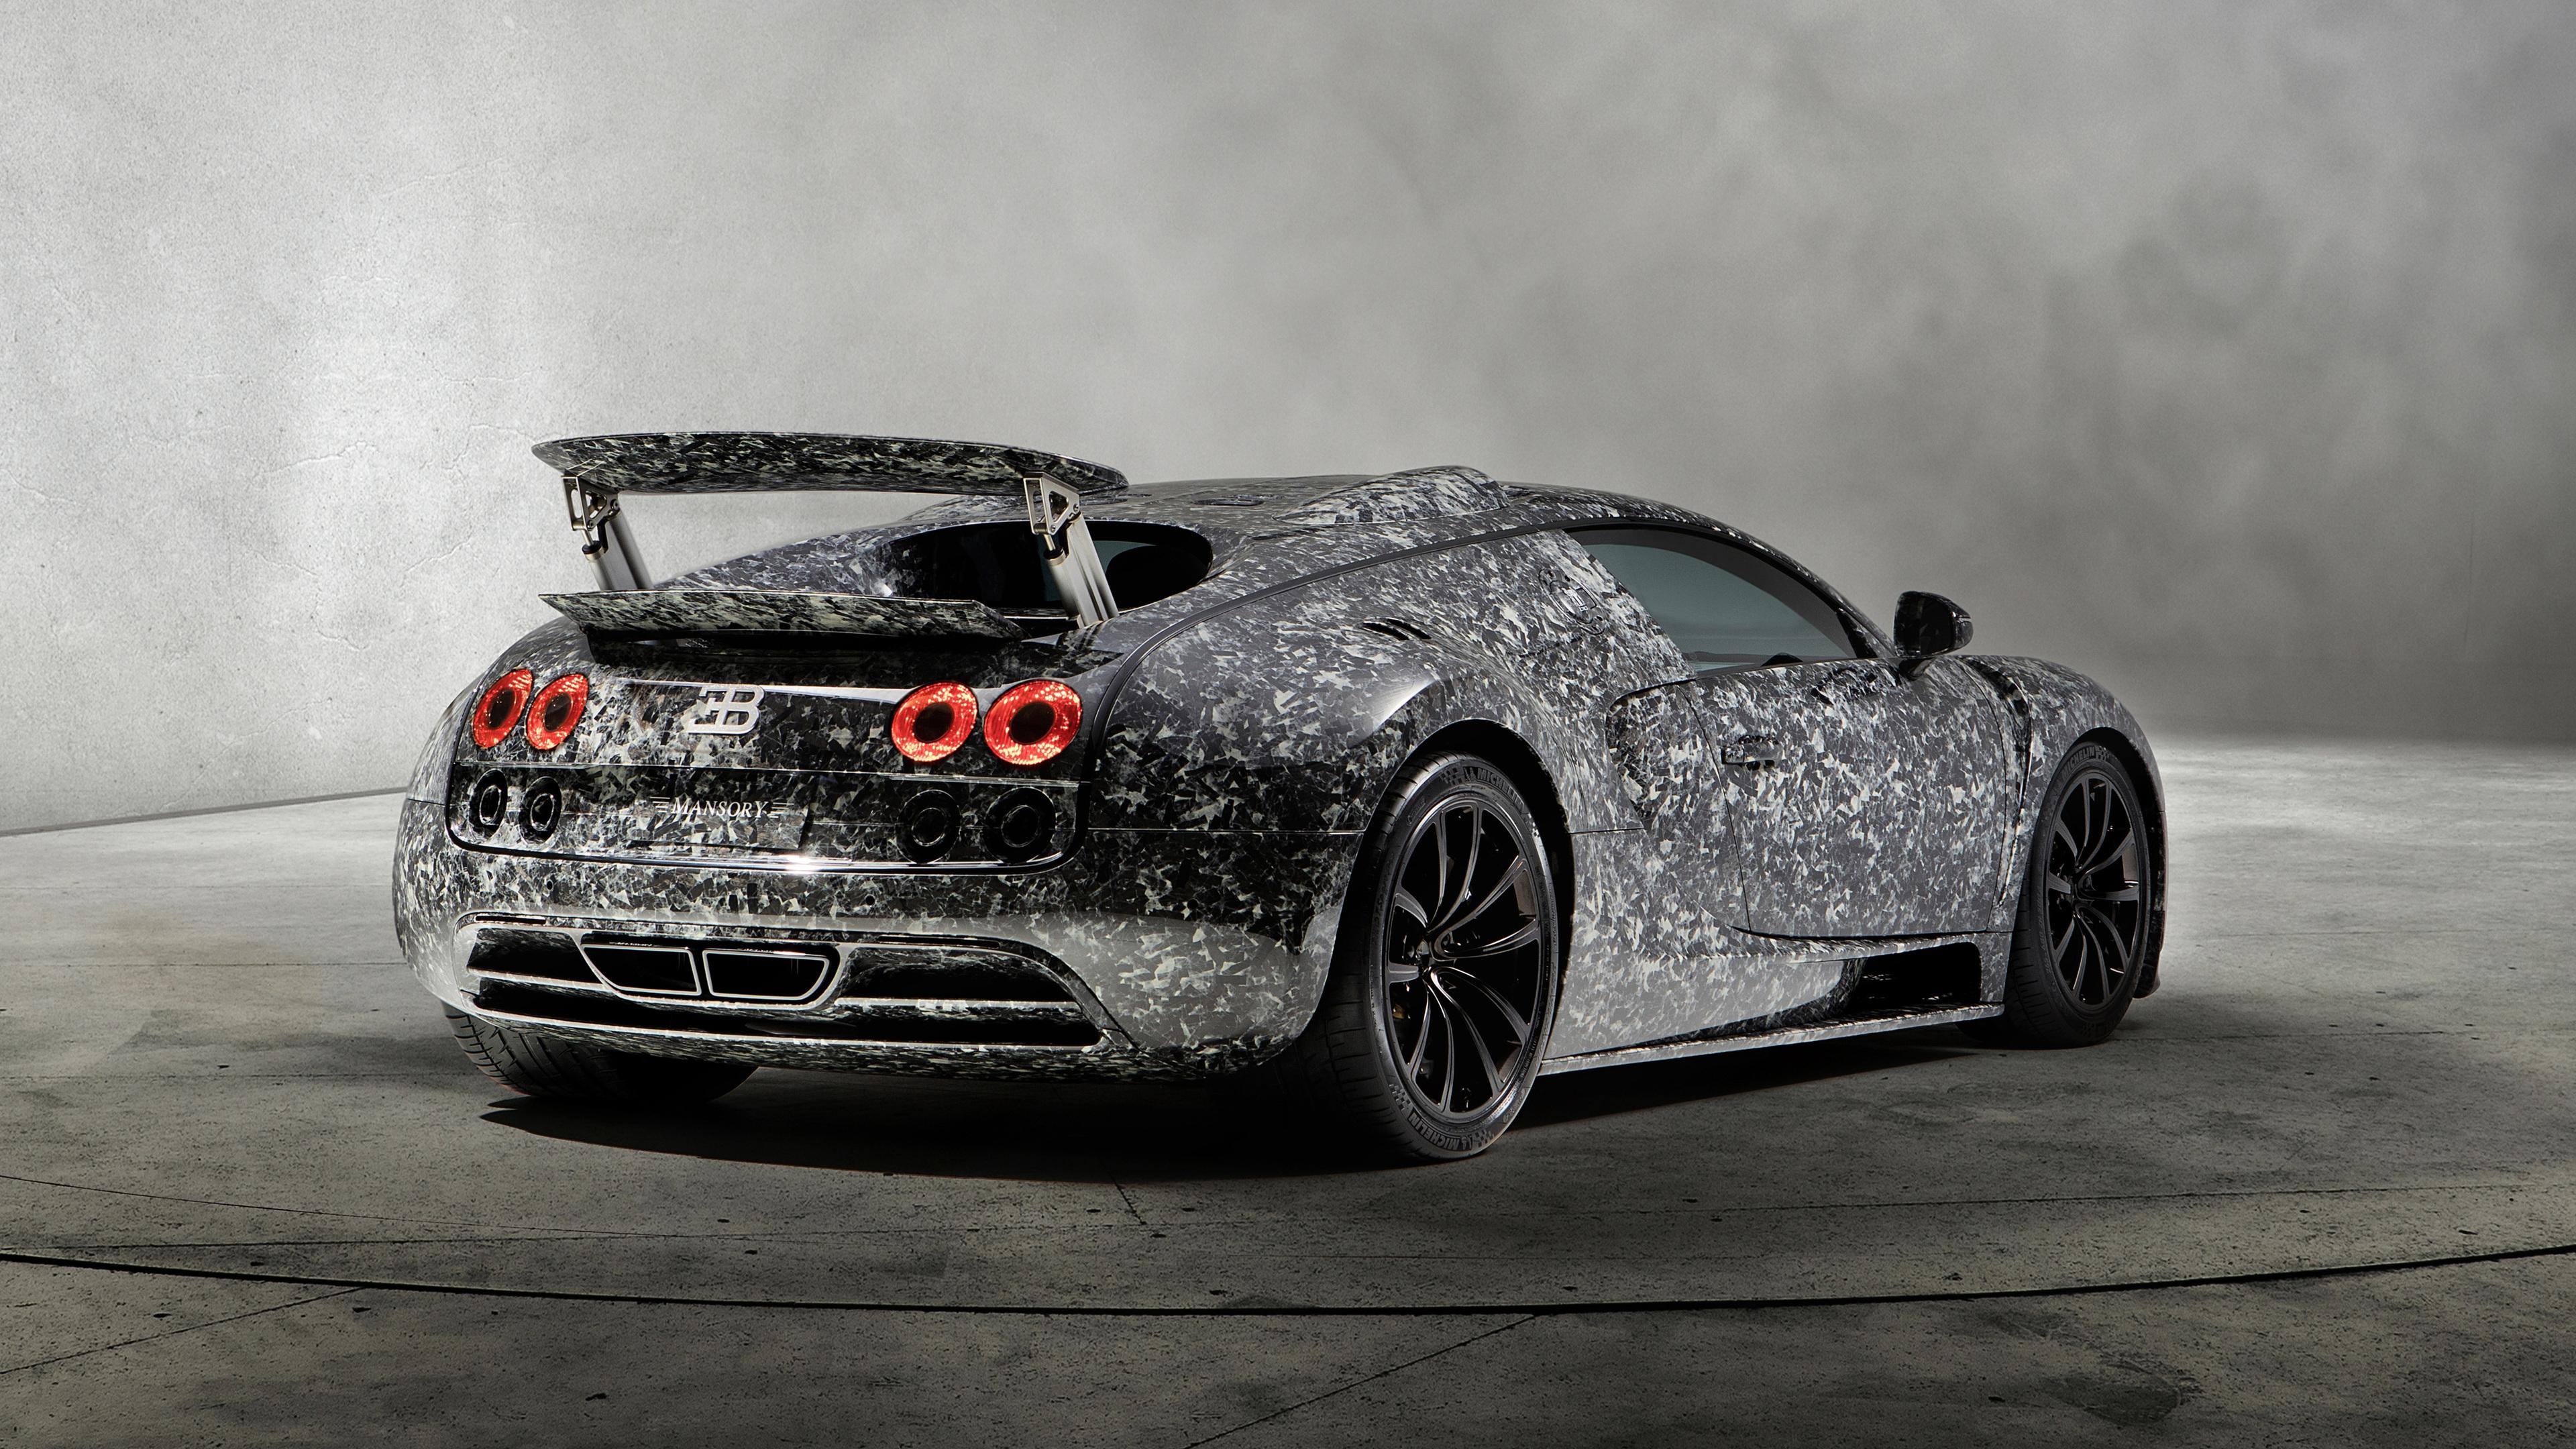 2018 mansory bugatti veyron vivere diamond edition rear 1539110099 - 2018 Mansory Bugatti Veyron Vivere Diamond Edition Rear - mansory wallpapers, hd-wallpapers, cars wallpapers, bugatti veyron wallpapers, 4k-wallpapers, 2018 cars wallpapers